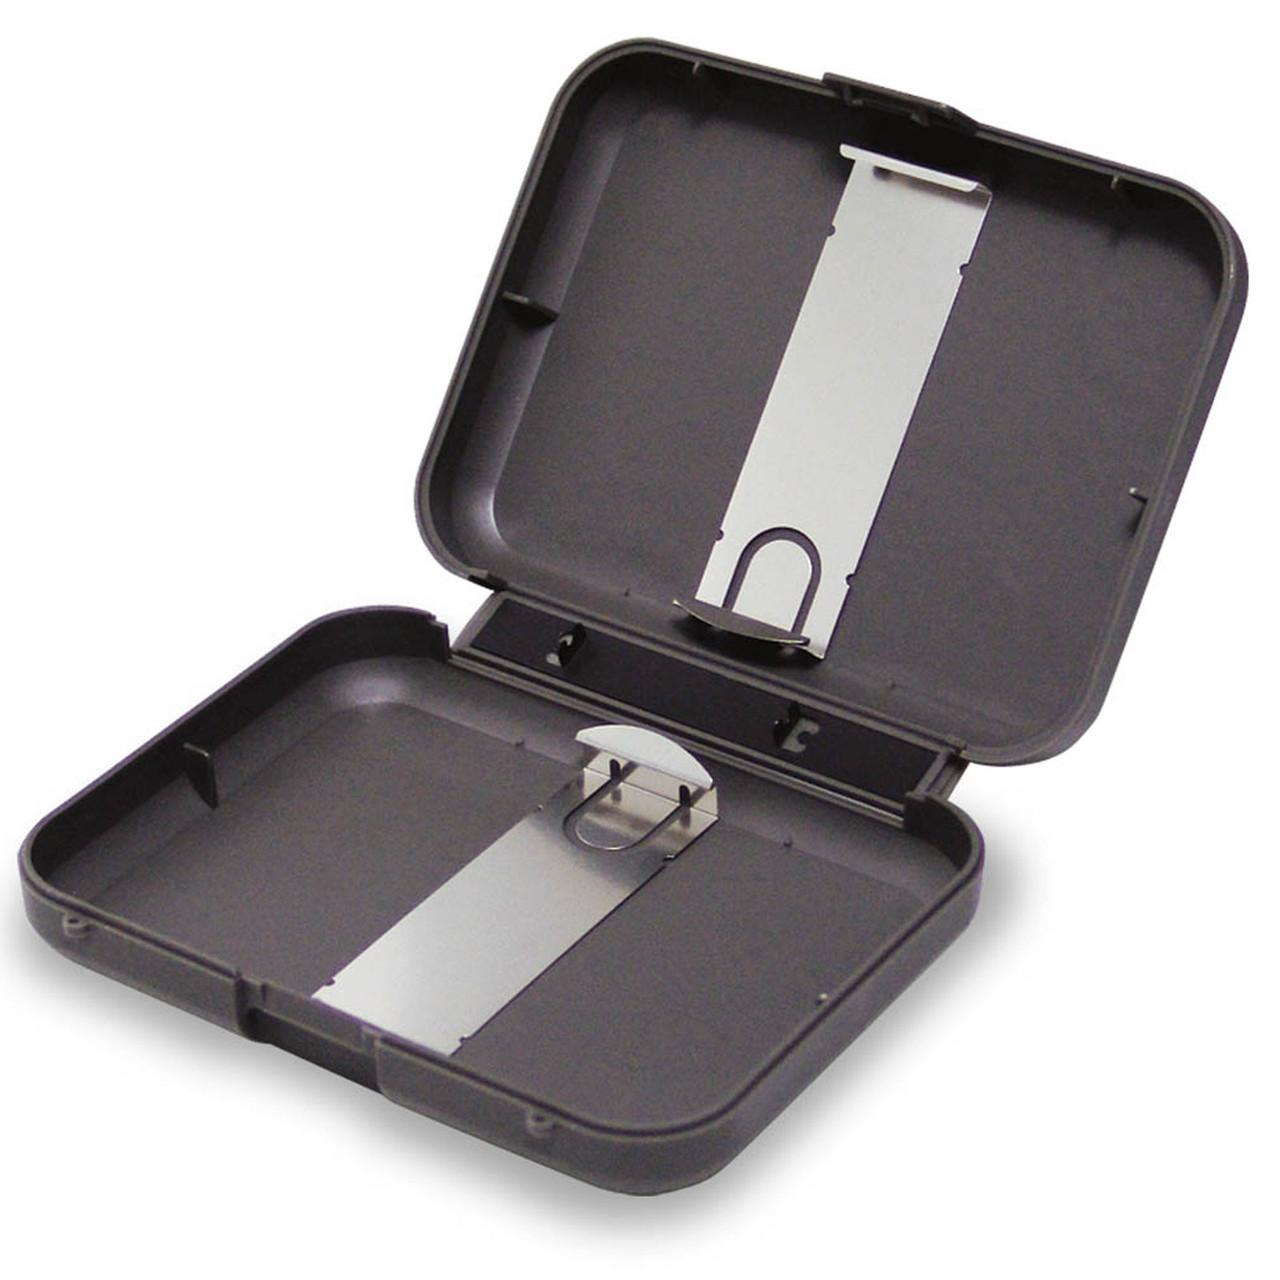 C/&F Design FSA-1504 S-size System 4 Row Fly Box